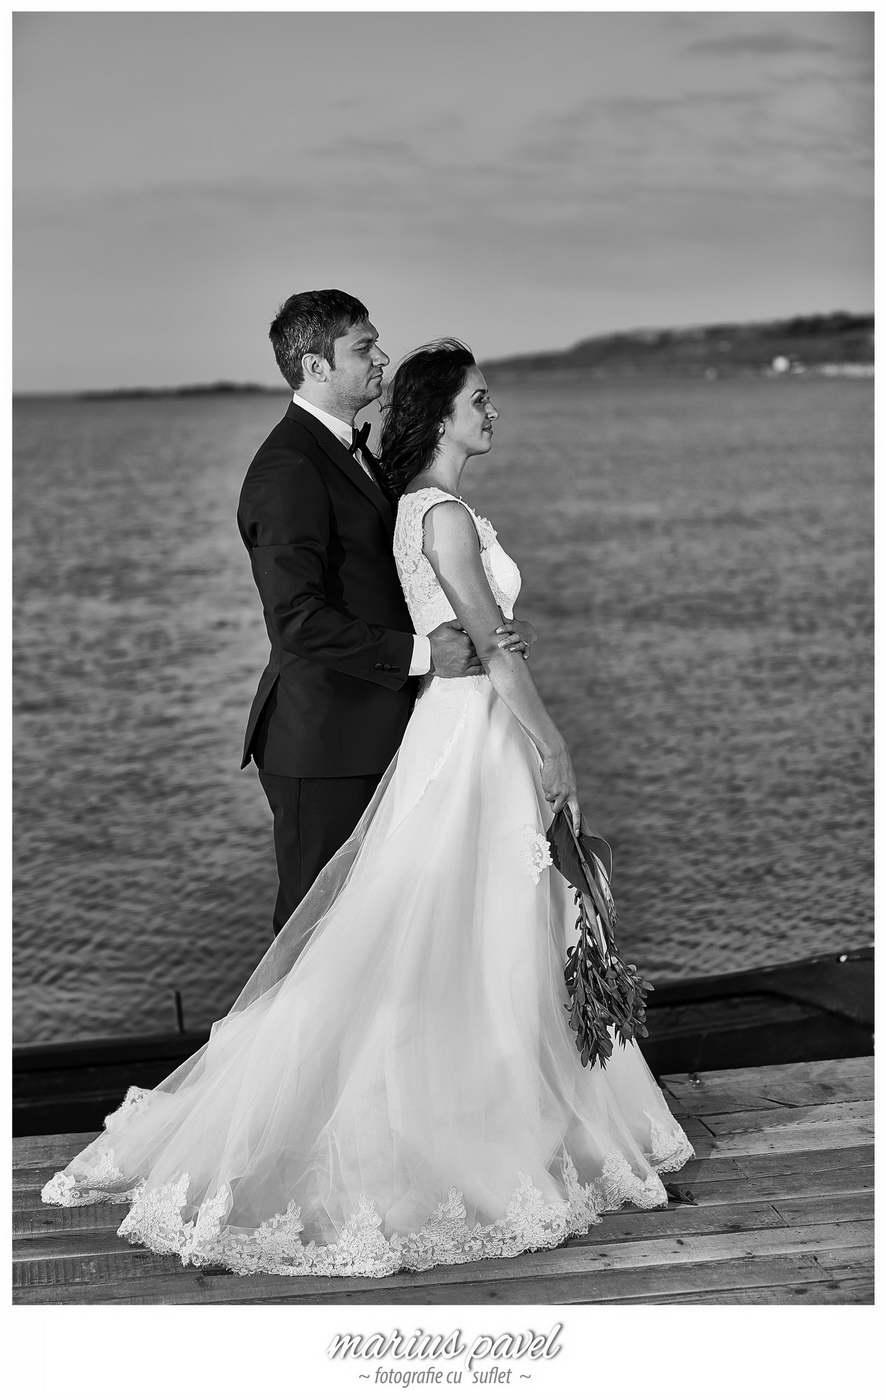 Sedinta dupa nunta la Marea Neagra cu mirii